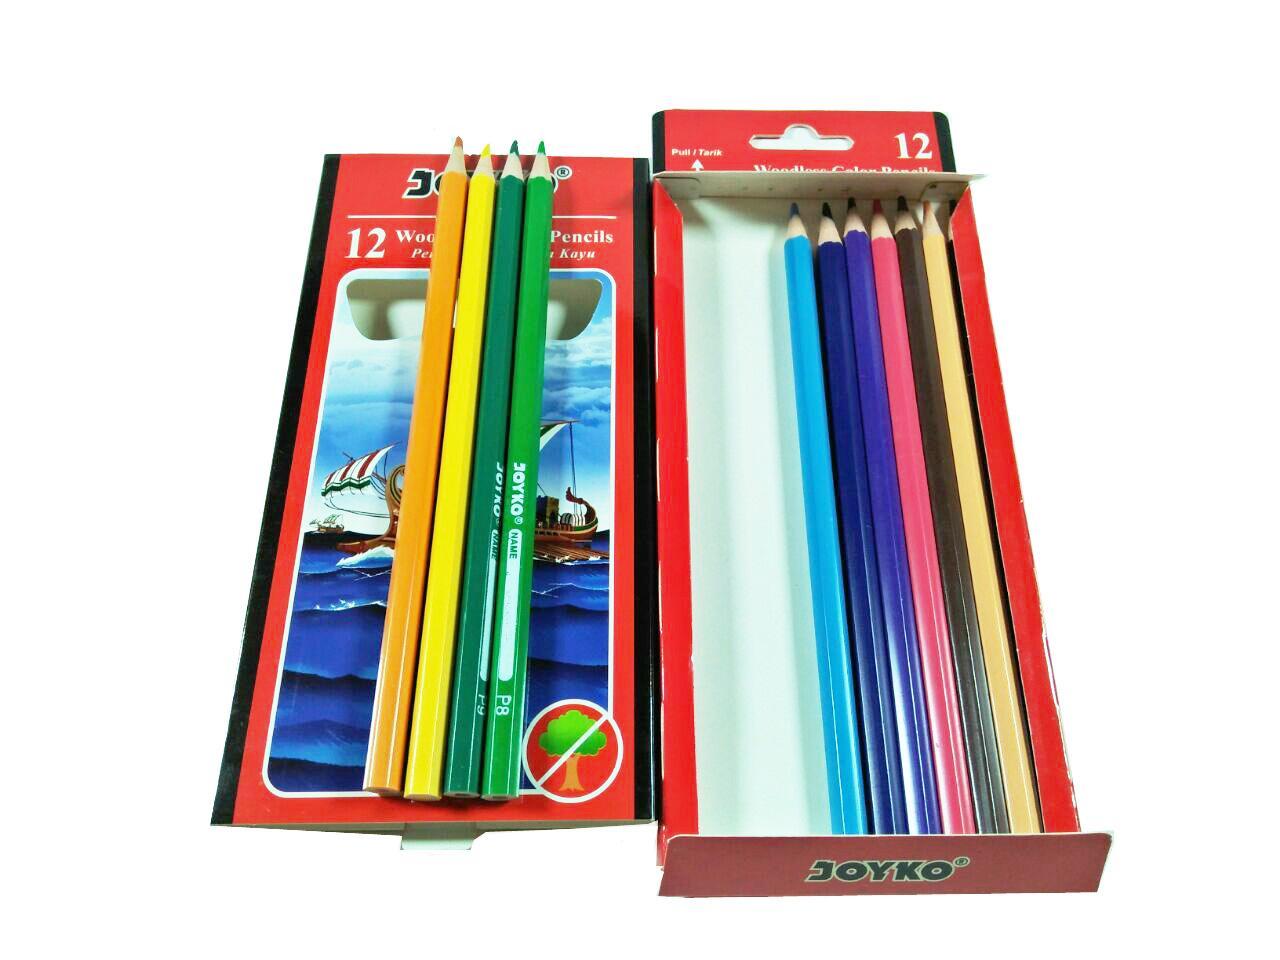 Alat gambar pensil pinsil warna Joyko atau Kenko isi 12 pcs